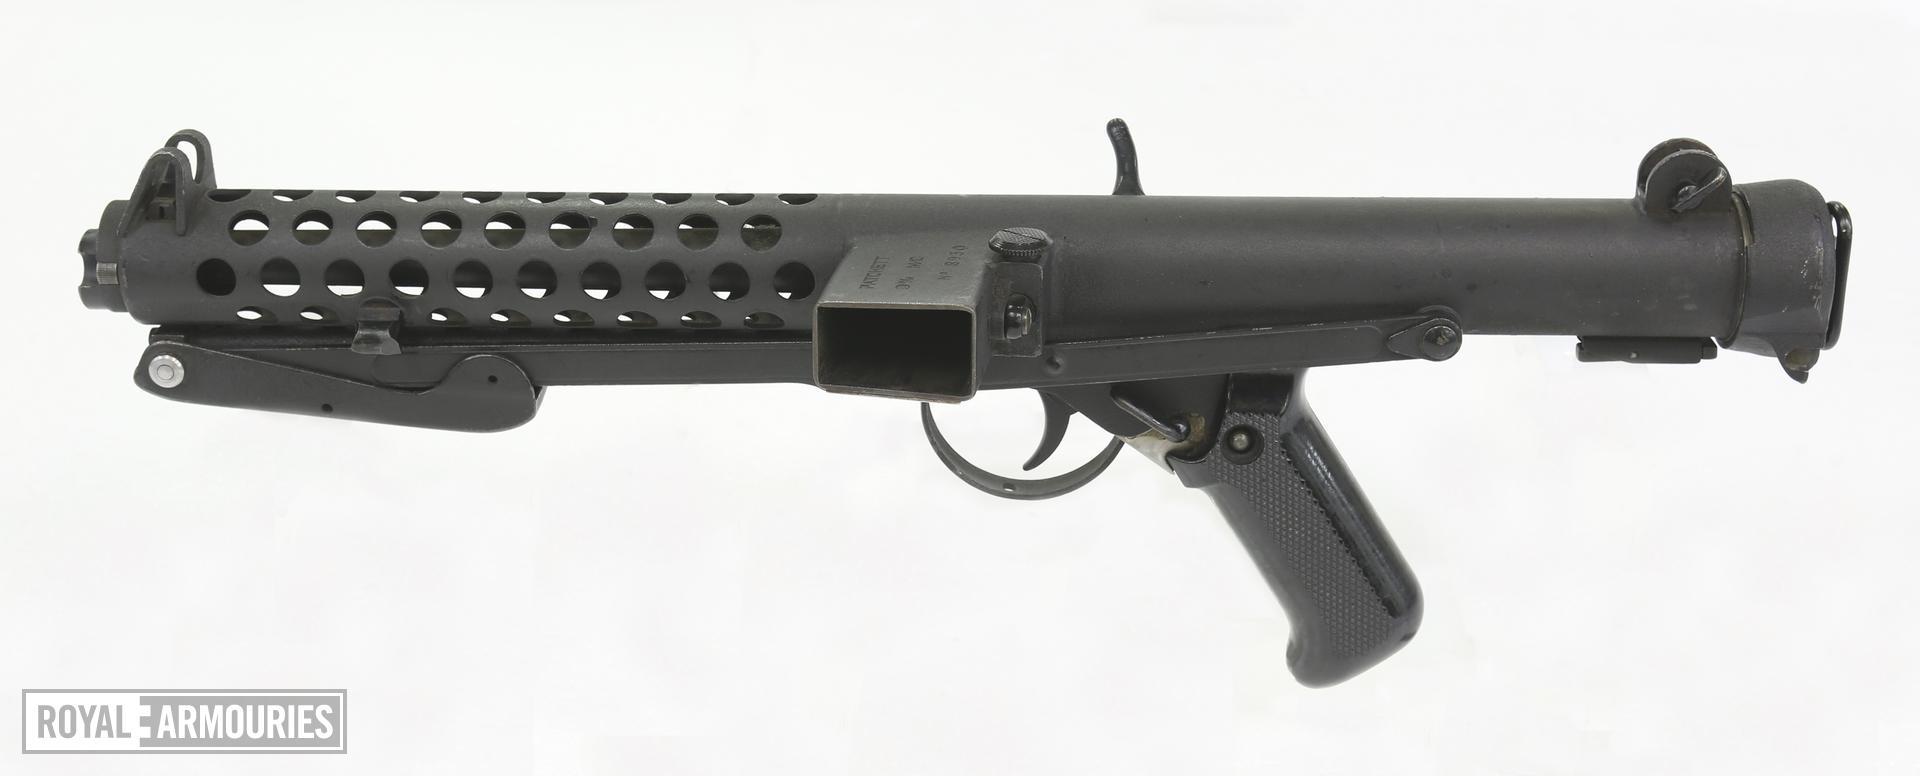 Centrefire automatic submachine gun. Patchett Mk.II Experimental. Troop trials pattern  designated 'Patchett, 9mm, M/C' with Churchill dedication. PR.7330